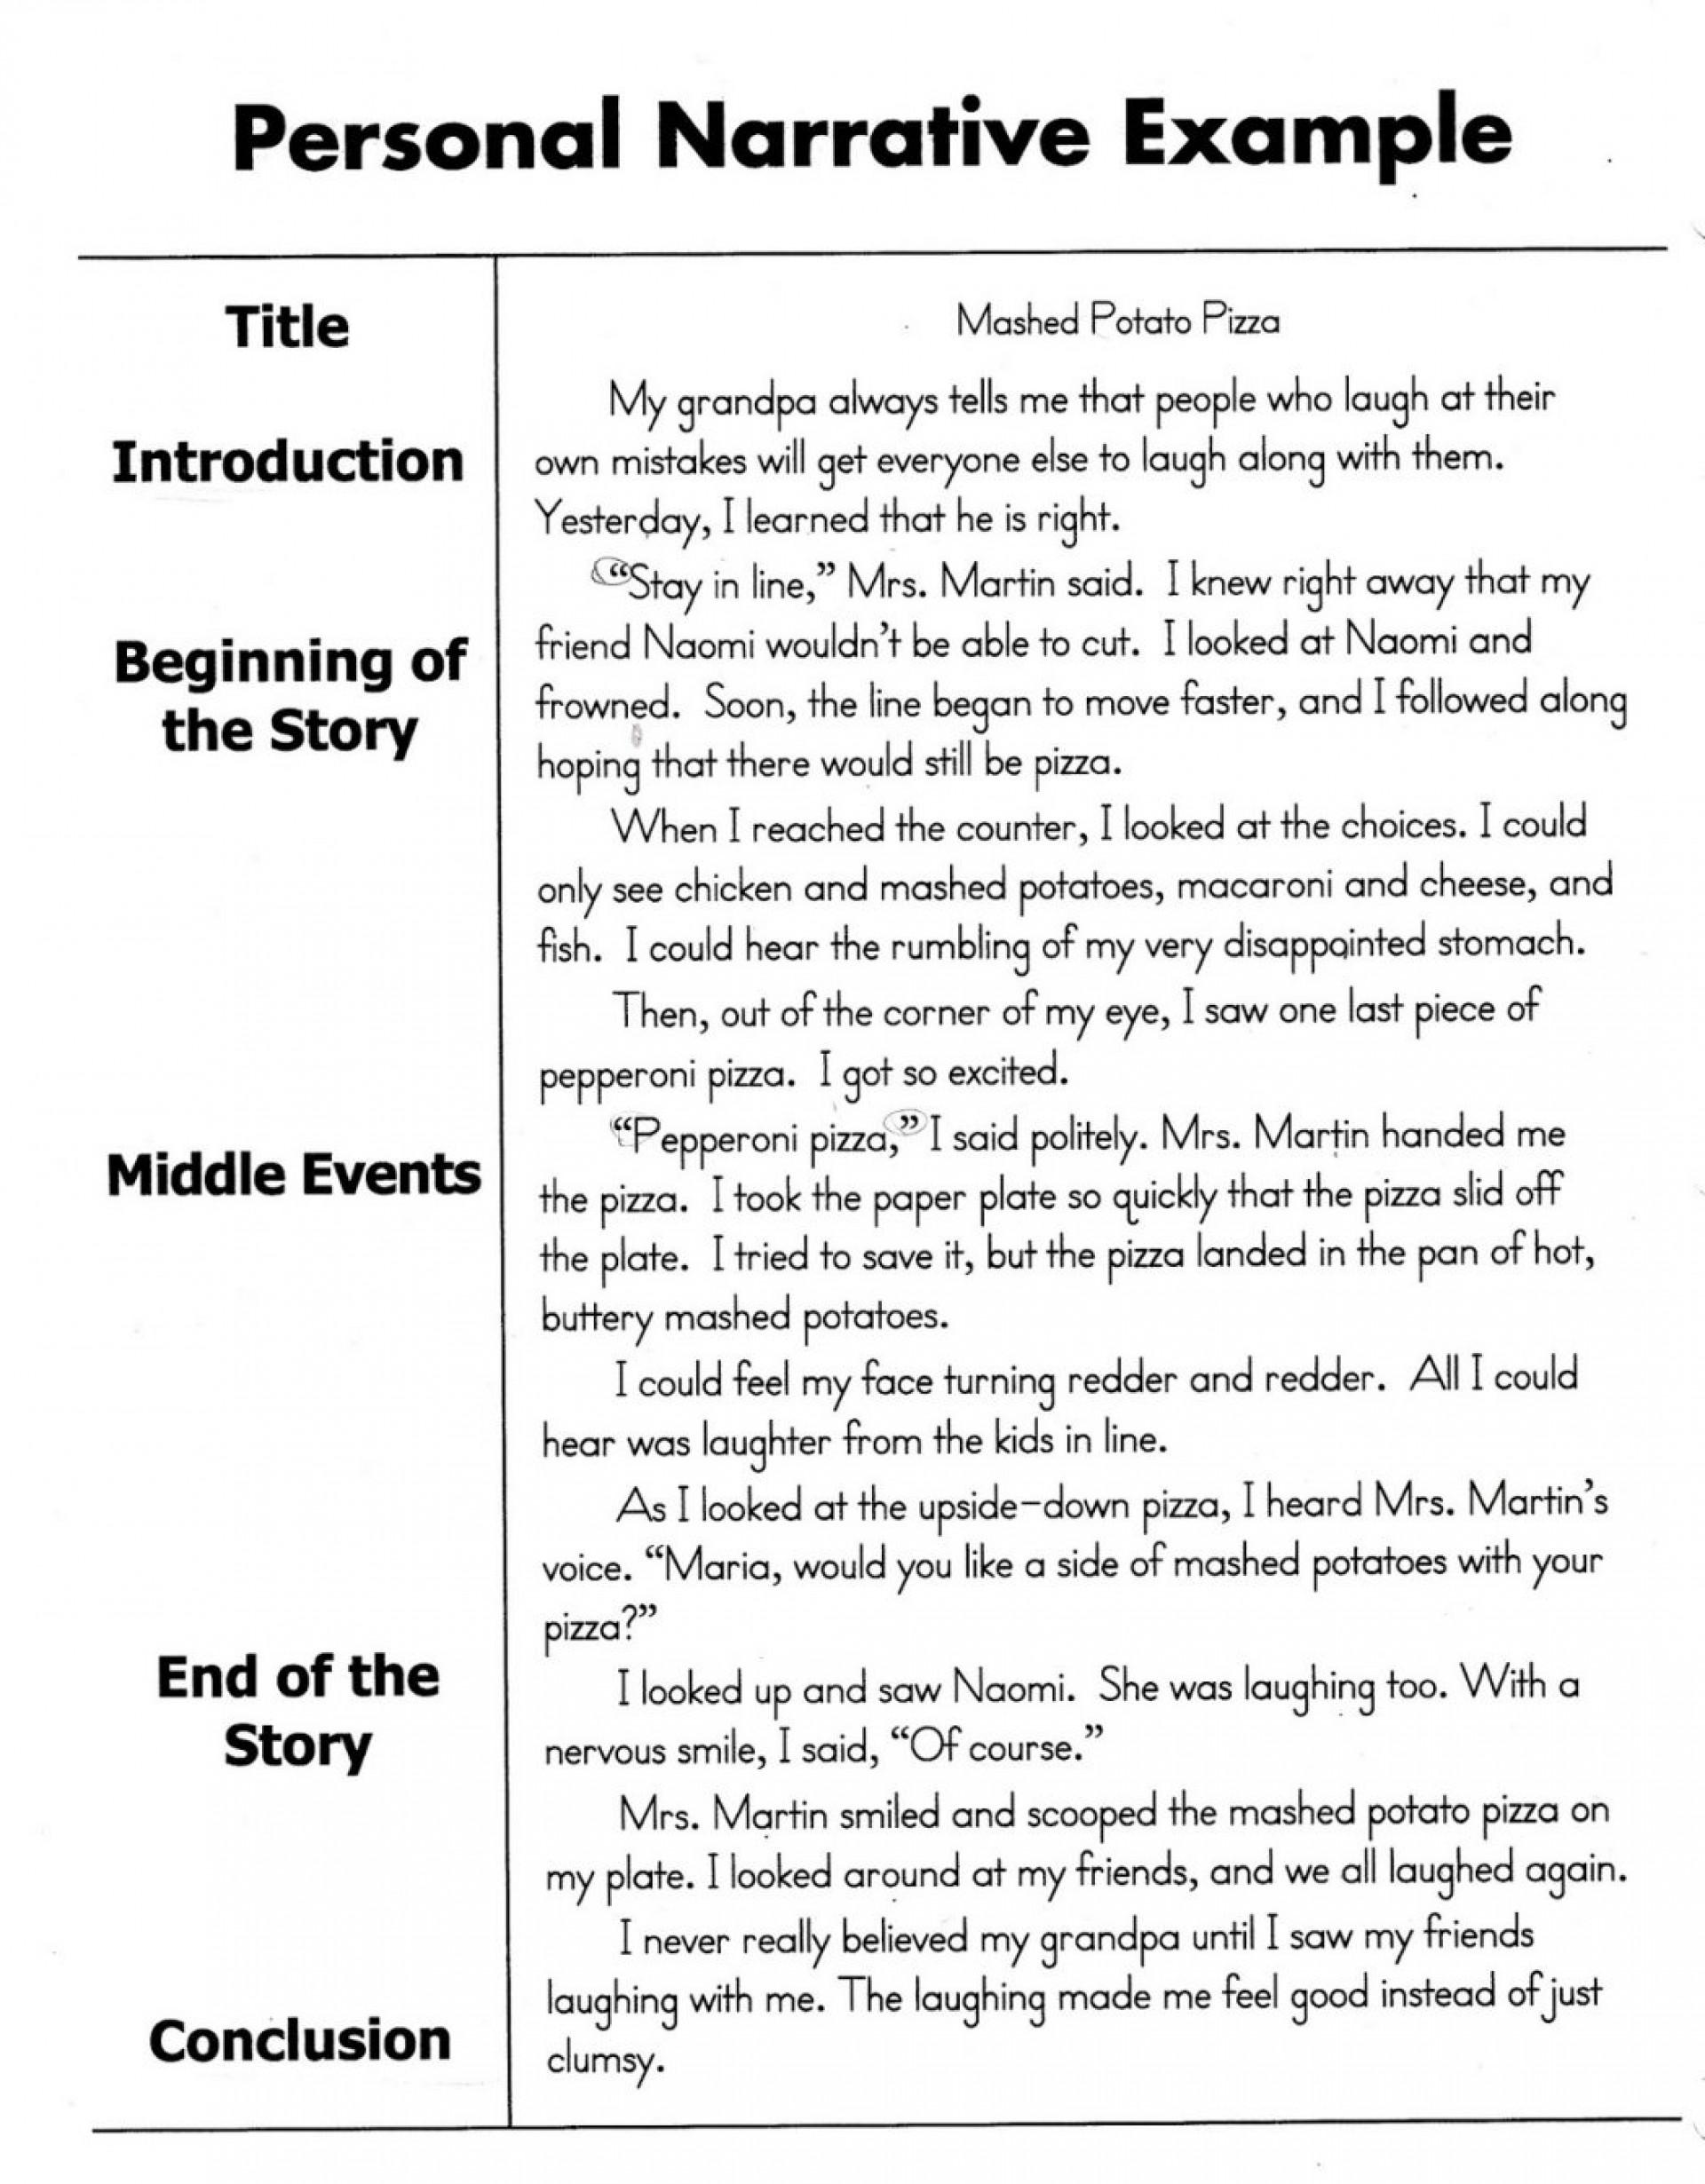 004 Macbeth Essay Topics Example Topic Sample Narrative High School For College Students Personal Prompts Surprising Examples Pdf Grade 11 Tragic Hero 1920